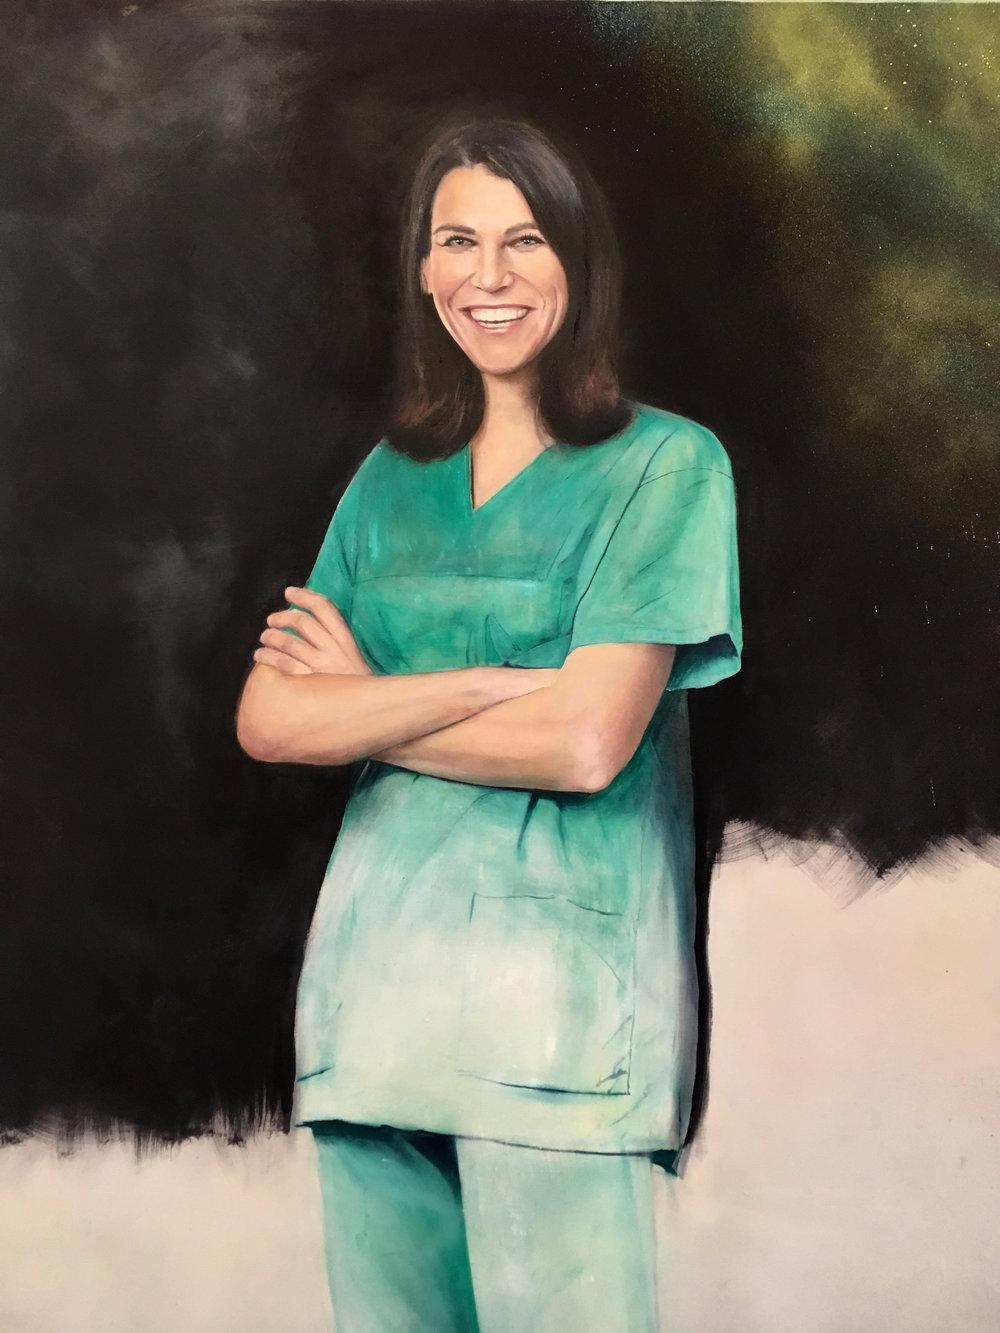 Ms M.K. oil on canvas, 200x140cm, 2018